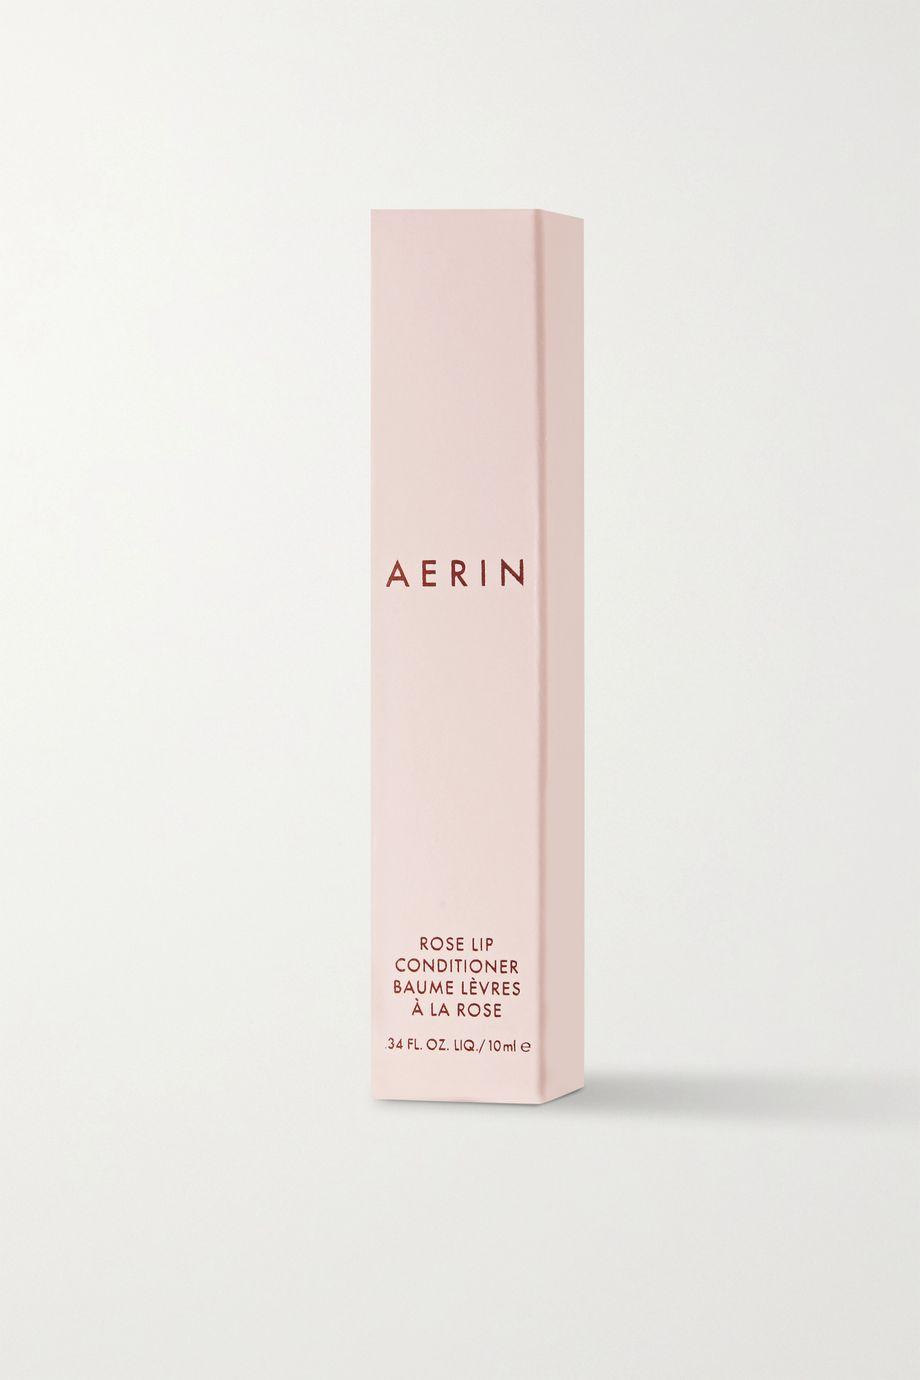 AERIN Beauty Rose Lip Conditioner